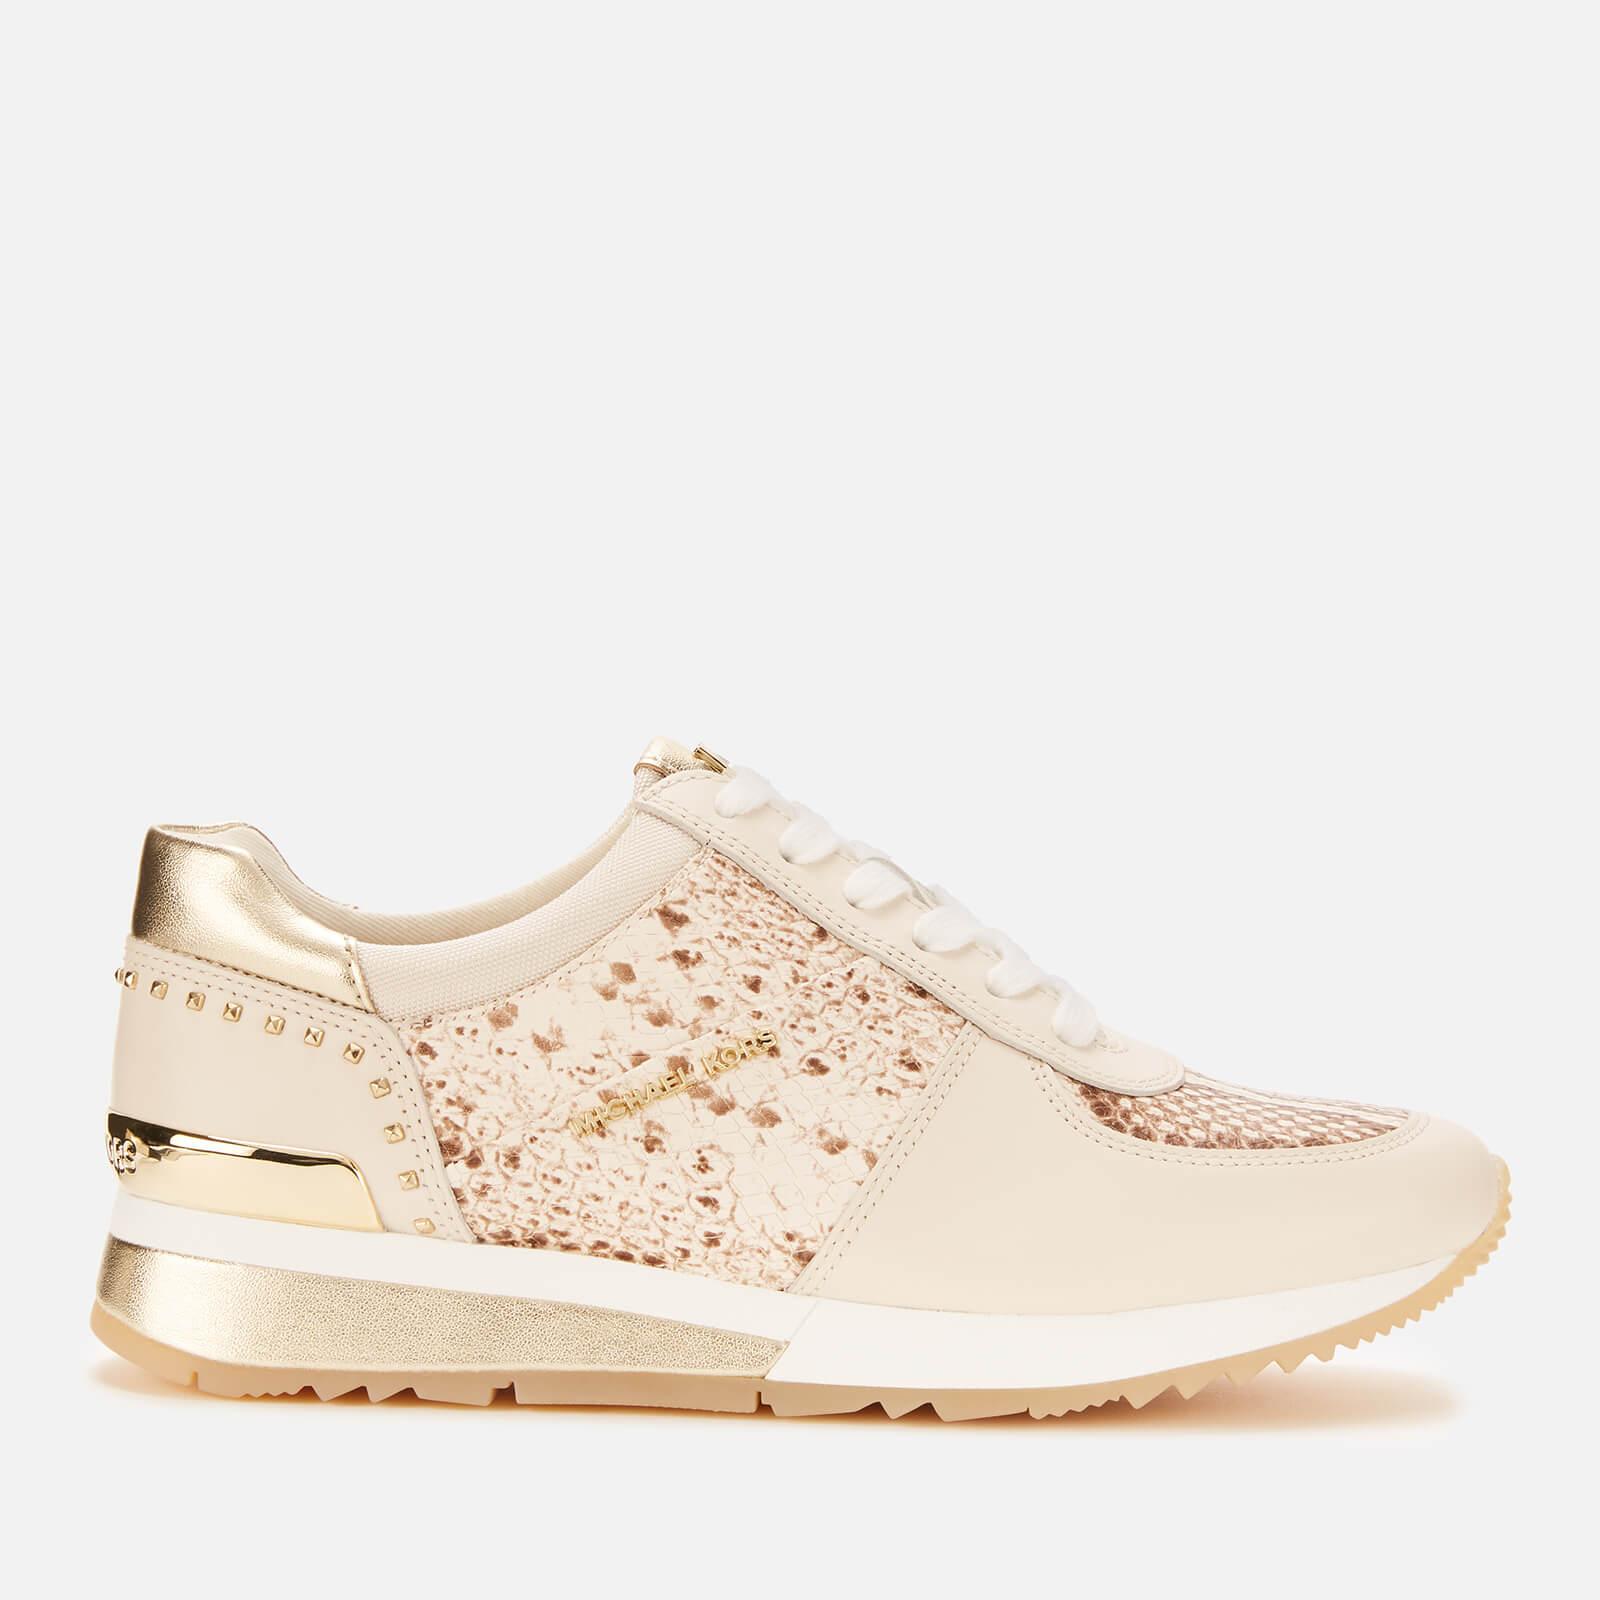 MICHAEL MICHAEL KORS Women's Allie Leather Wrap Runner Style Trainers - Light Cream - UK 6/US 9 - White